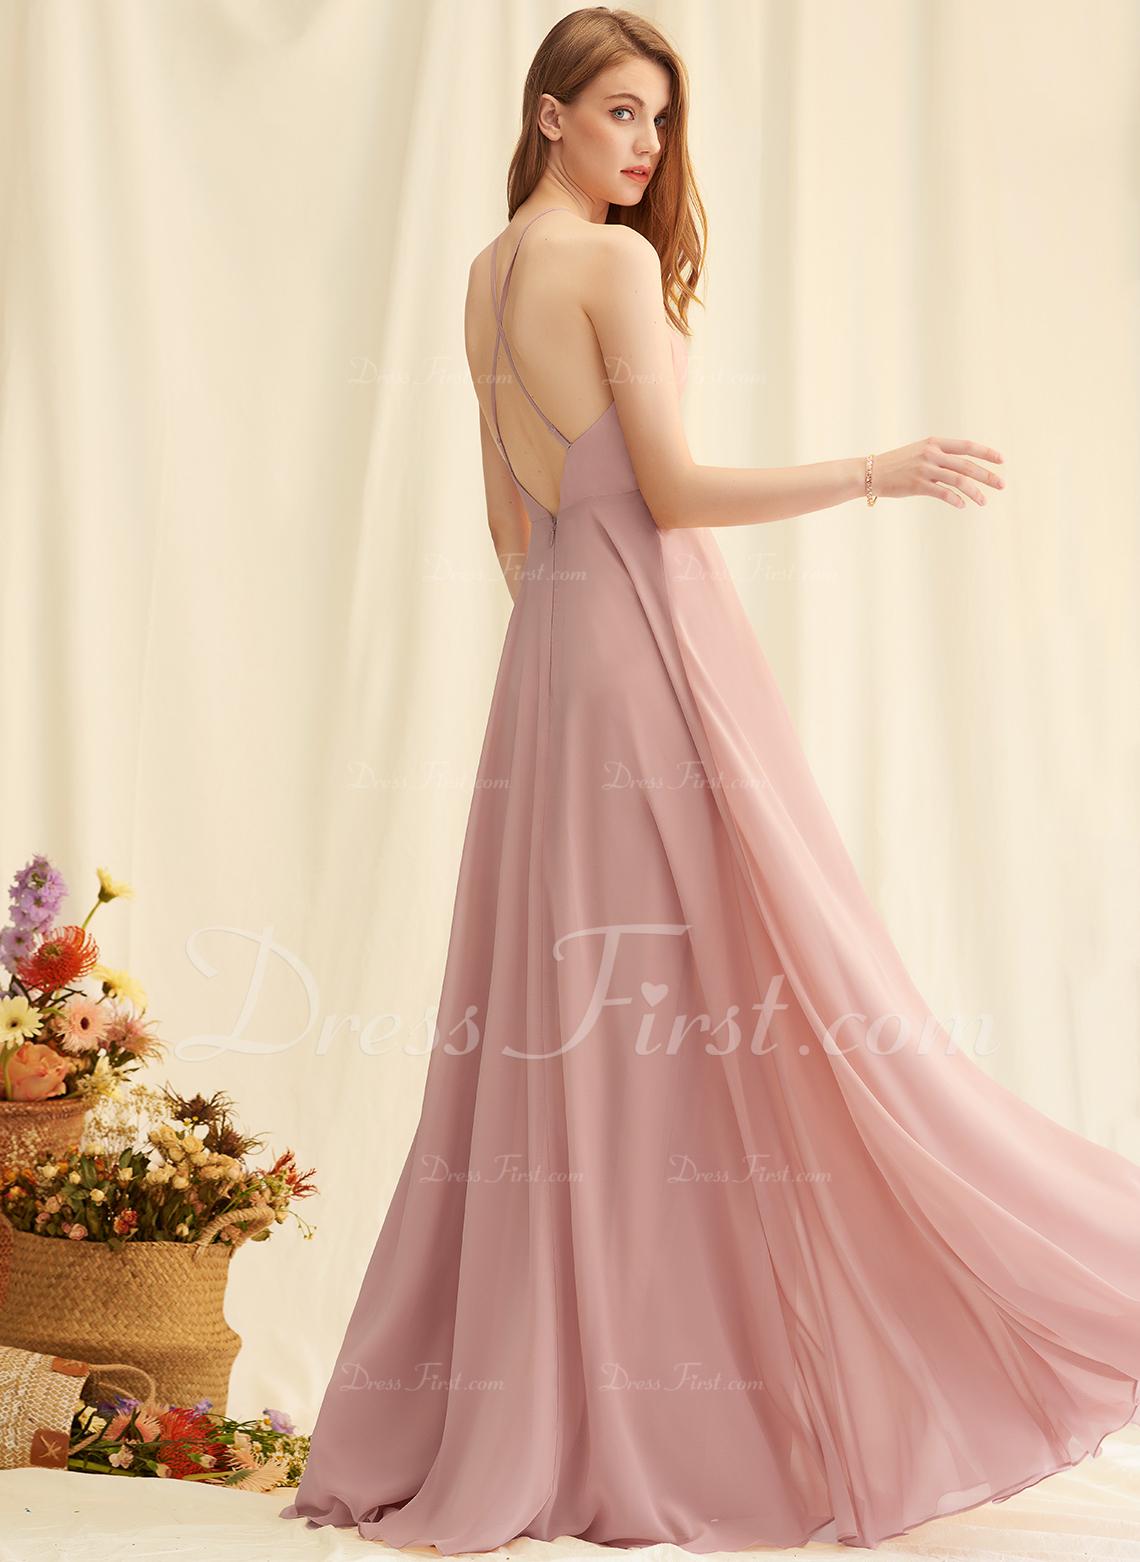 Scoop Neck Square Neckline Burgundy Floor-Length Chiffon Dresses